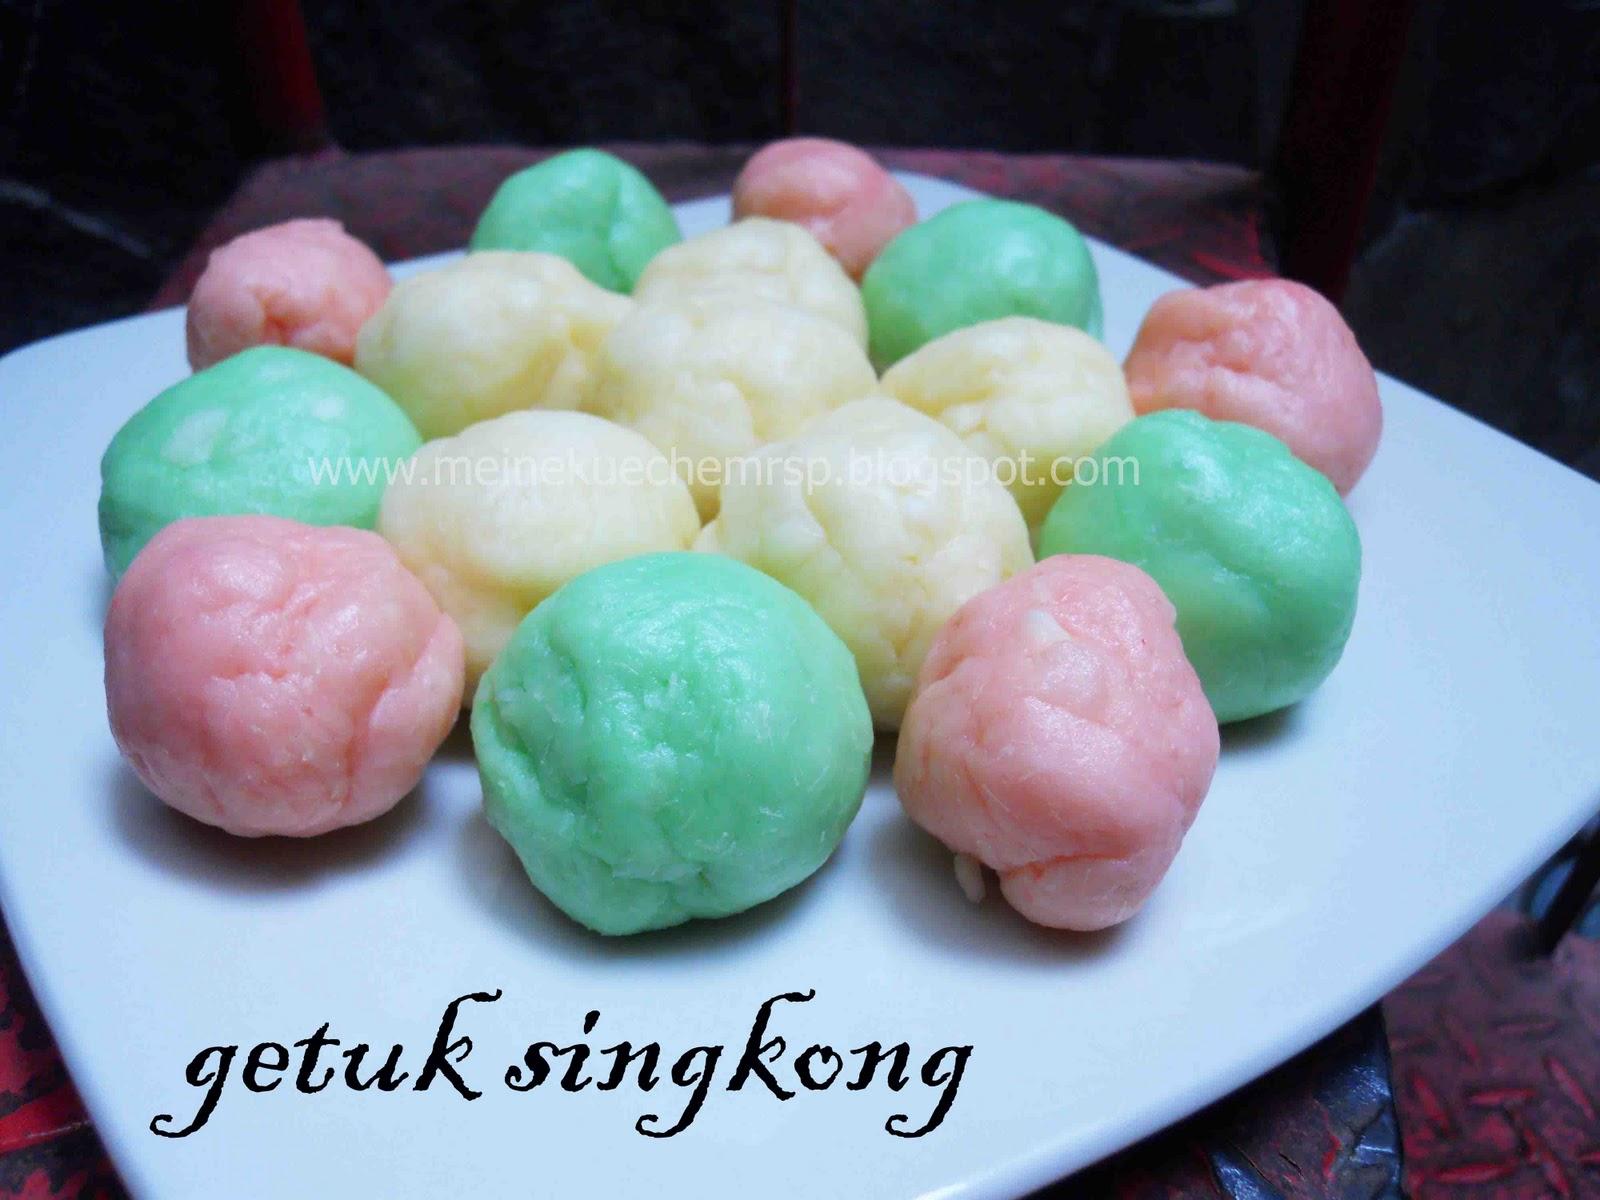 Home Resep Kue Basah Getuk Lindri Warna Warni Tabloid Nova Foto ...